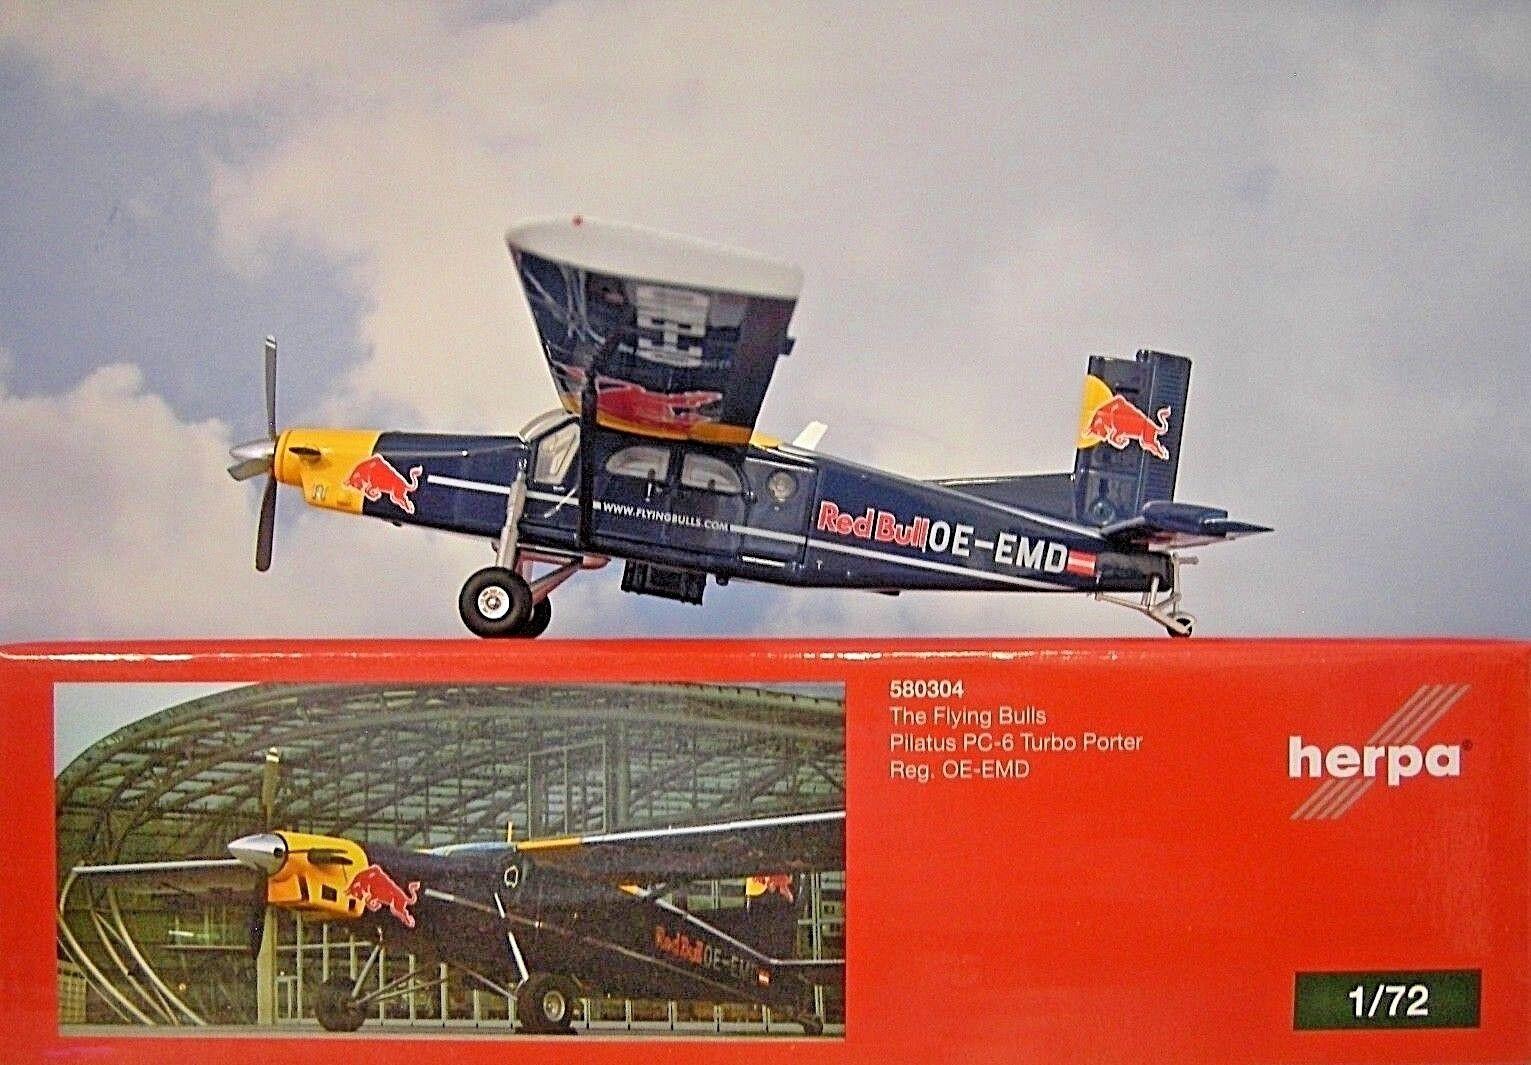 Herpa Wings 1 72 Pilate pc-6 Turbo Porter The Flying Bulls OE-EMD 580304